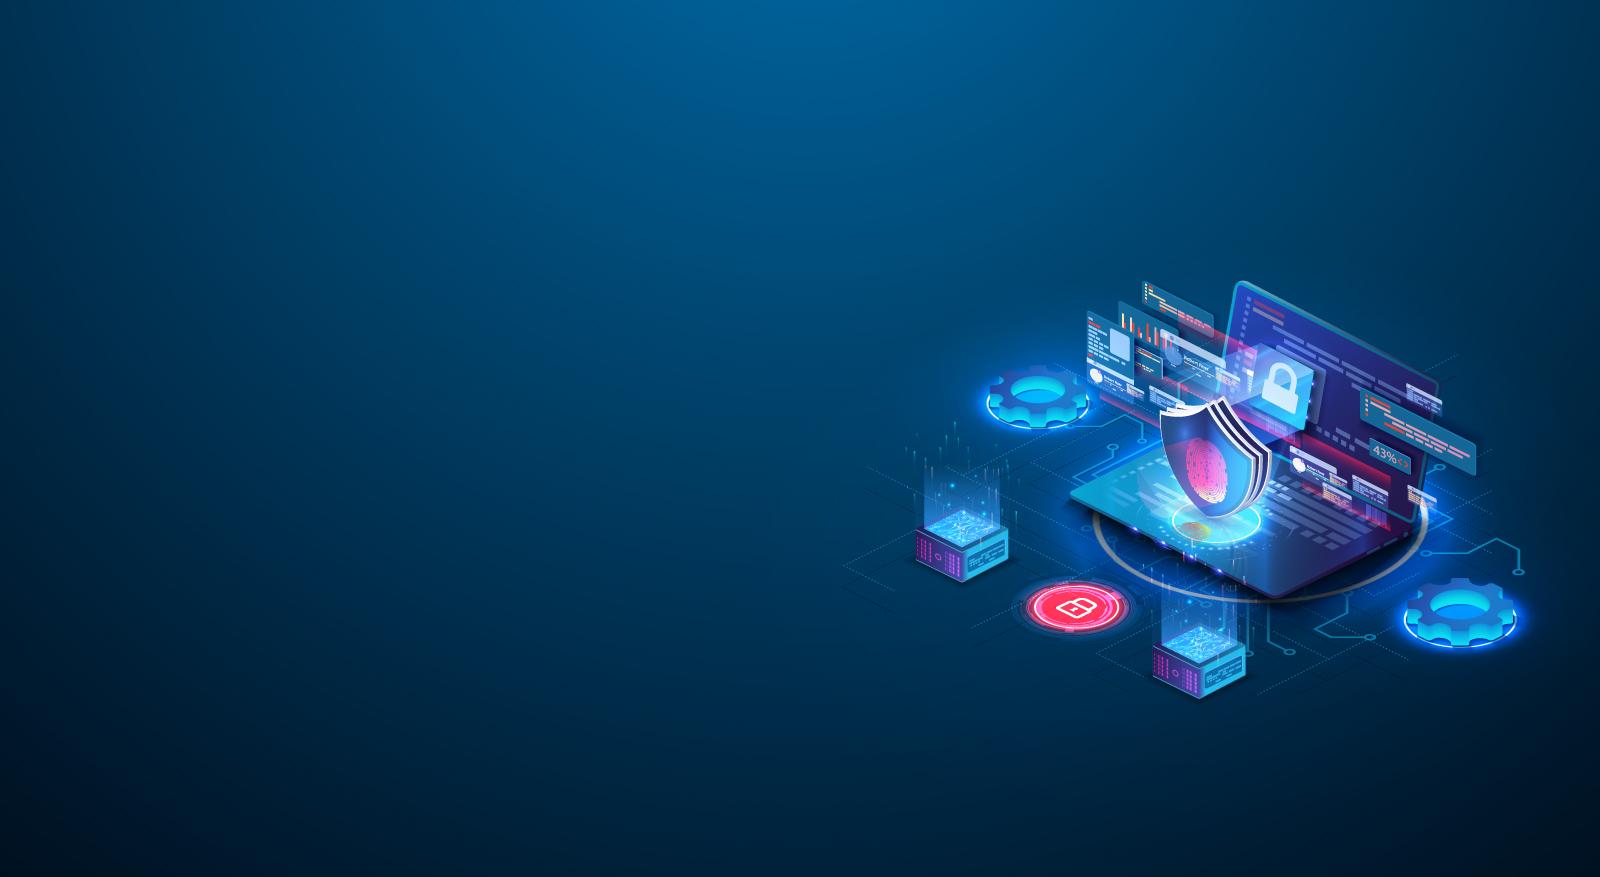 Catalogic Announces Free Hyper-V Backup to Small Enterprise